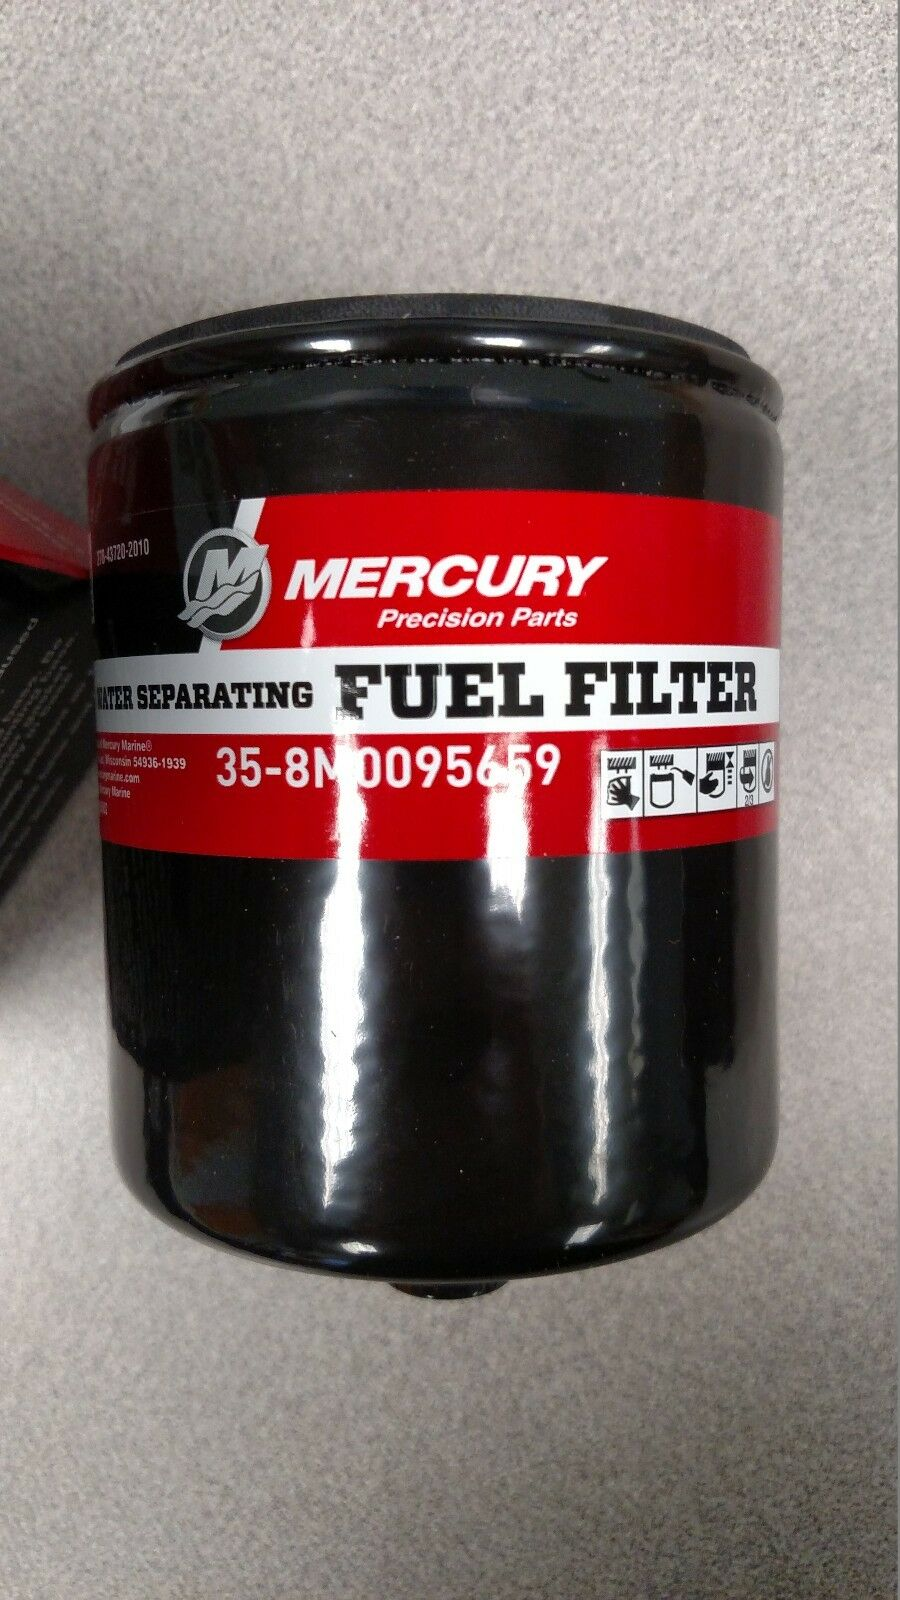 4 Pack Of Mercury Water Separating Fuel Filter 35 8m0095659